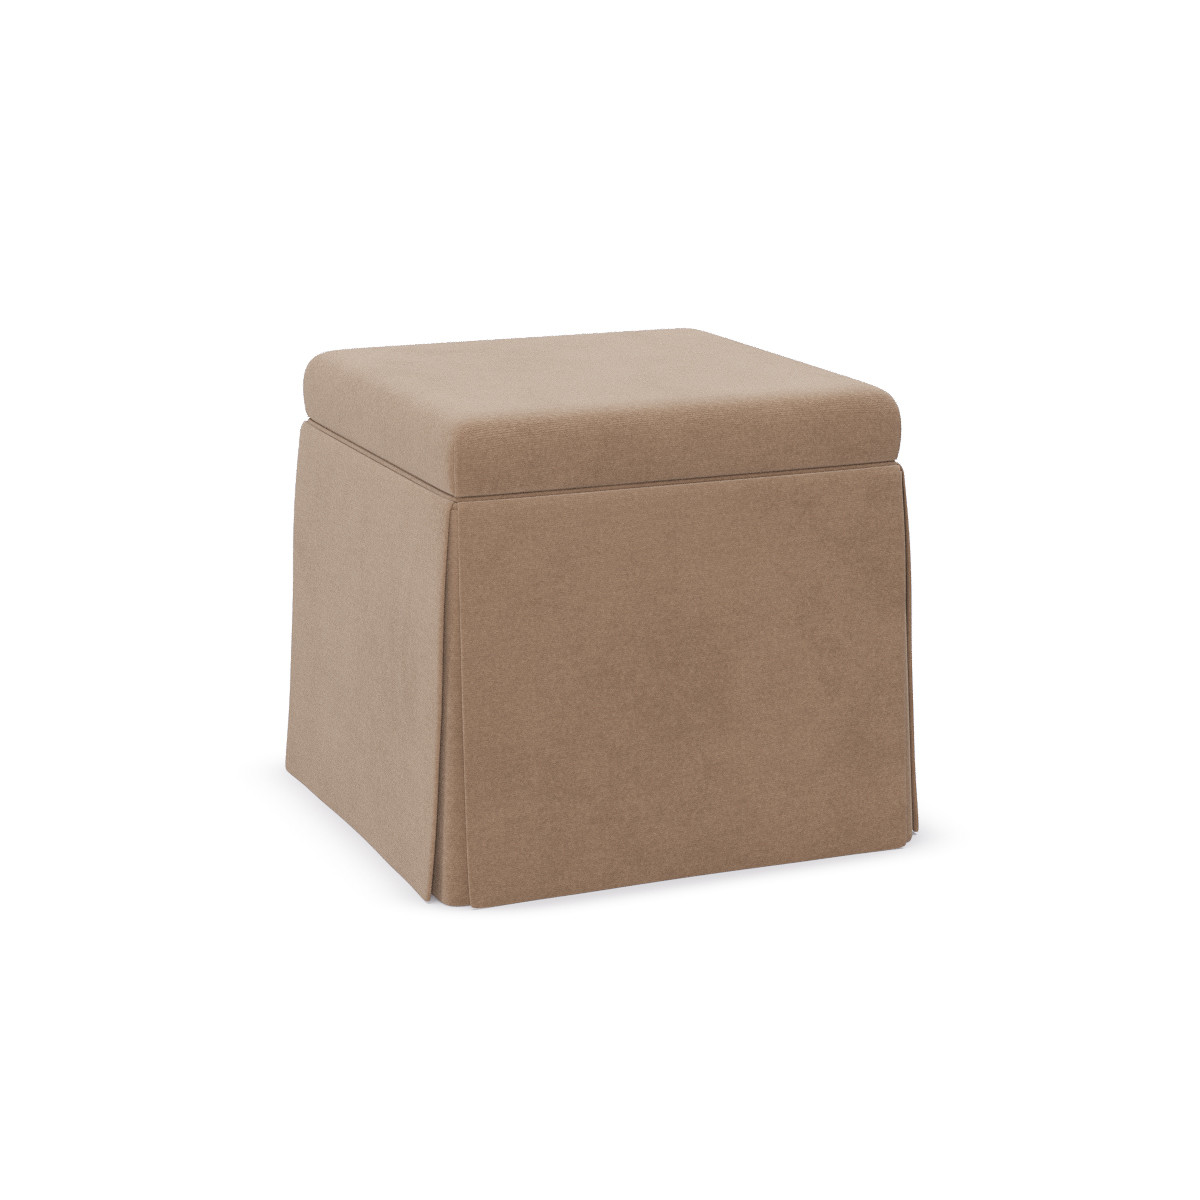 Super Skirted Storage Ottoman Sand Velvet Camellatalisay Diy Chair Ideas Camellatalisaycom